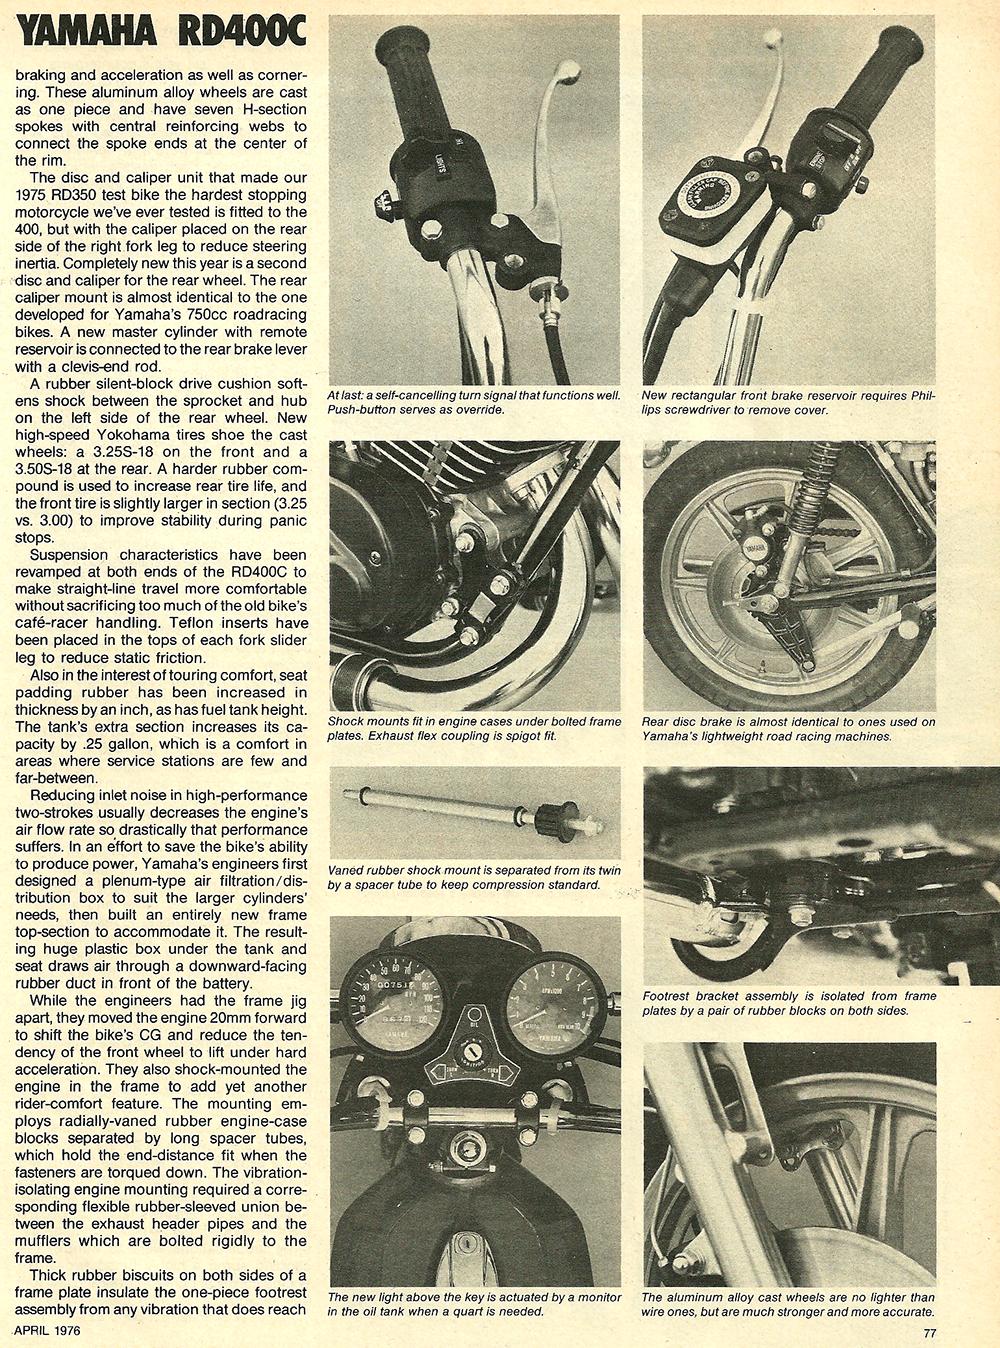 1976 Yamaha RD400C road test 4.jpg